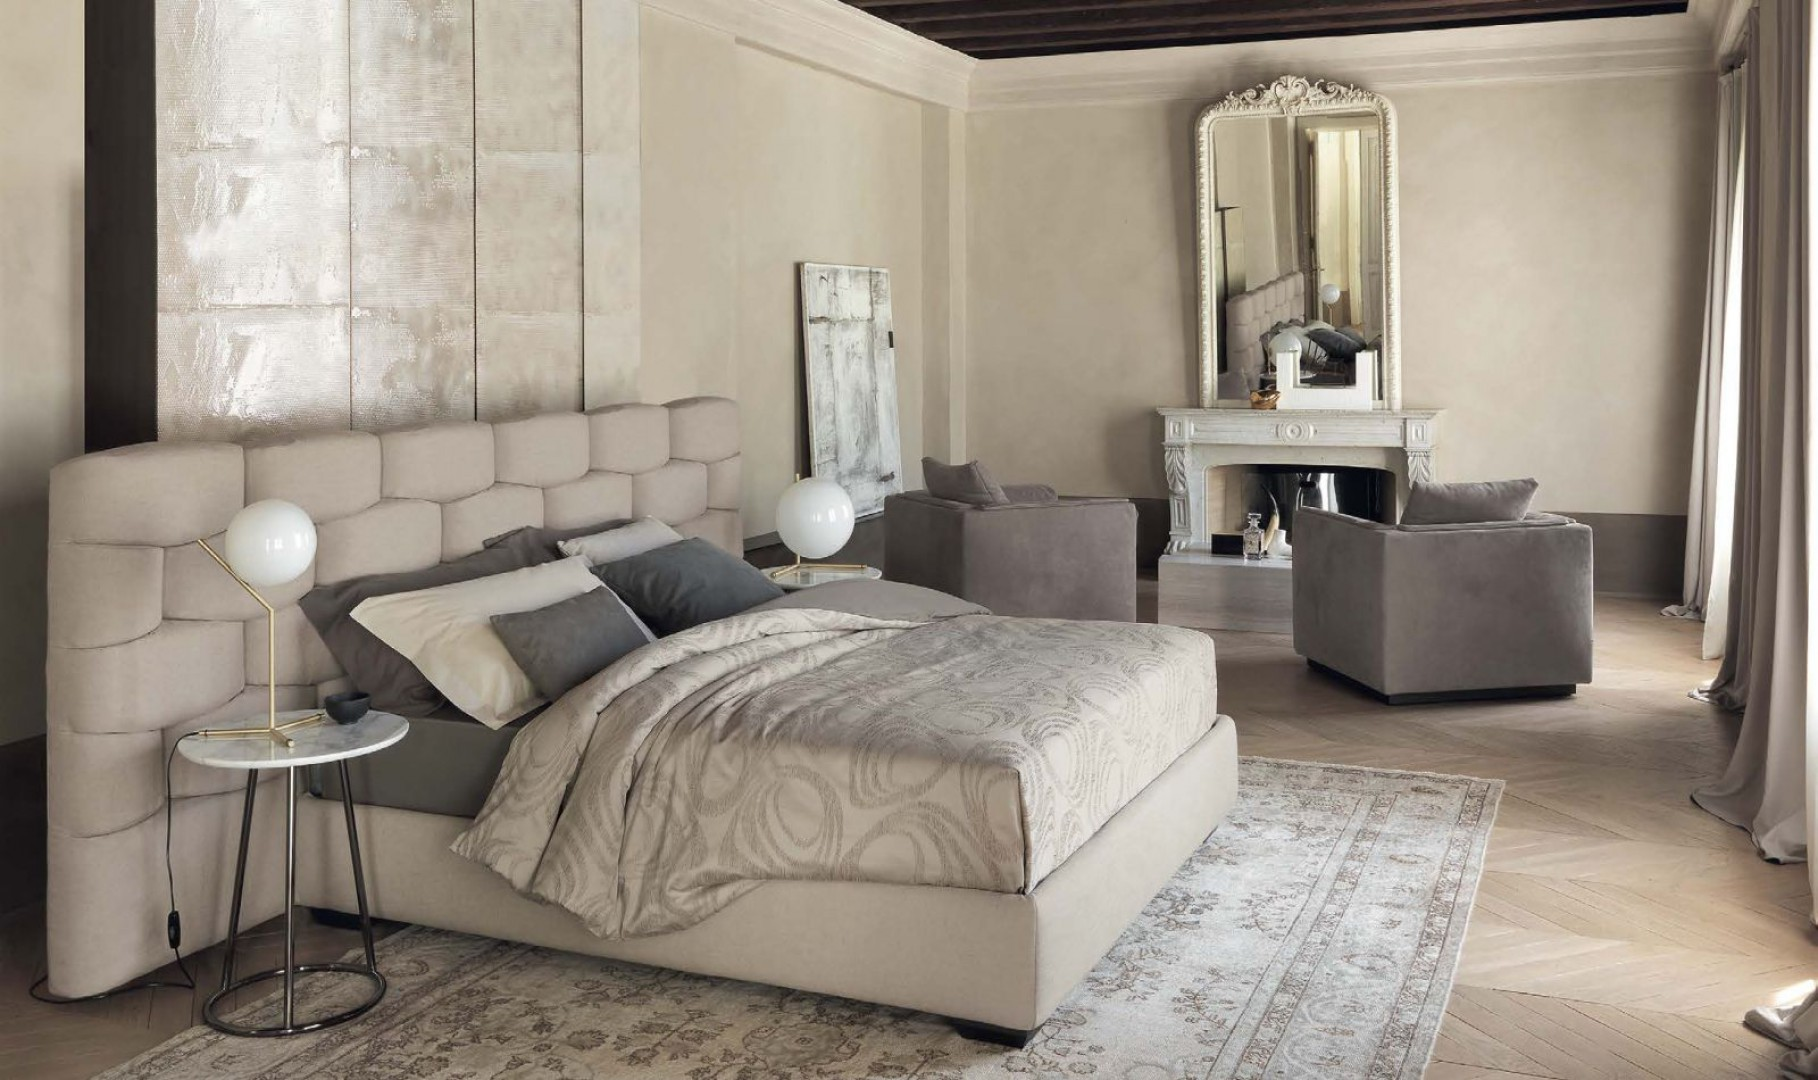 Efektowne łóżko Majal marki Flou. Fot. Galeria Heban